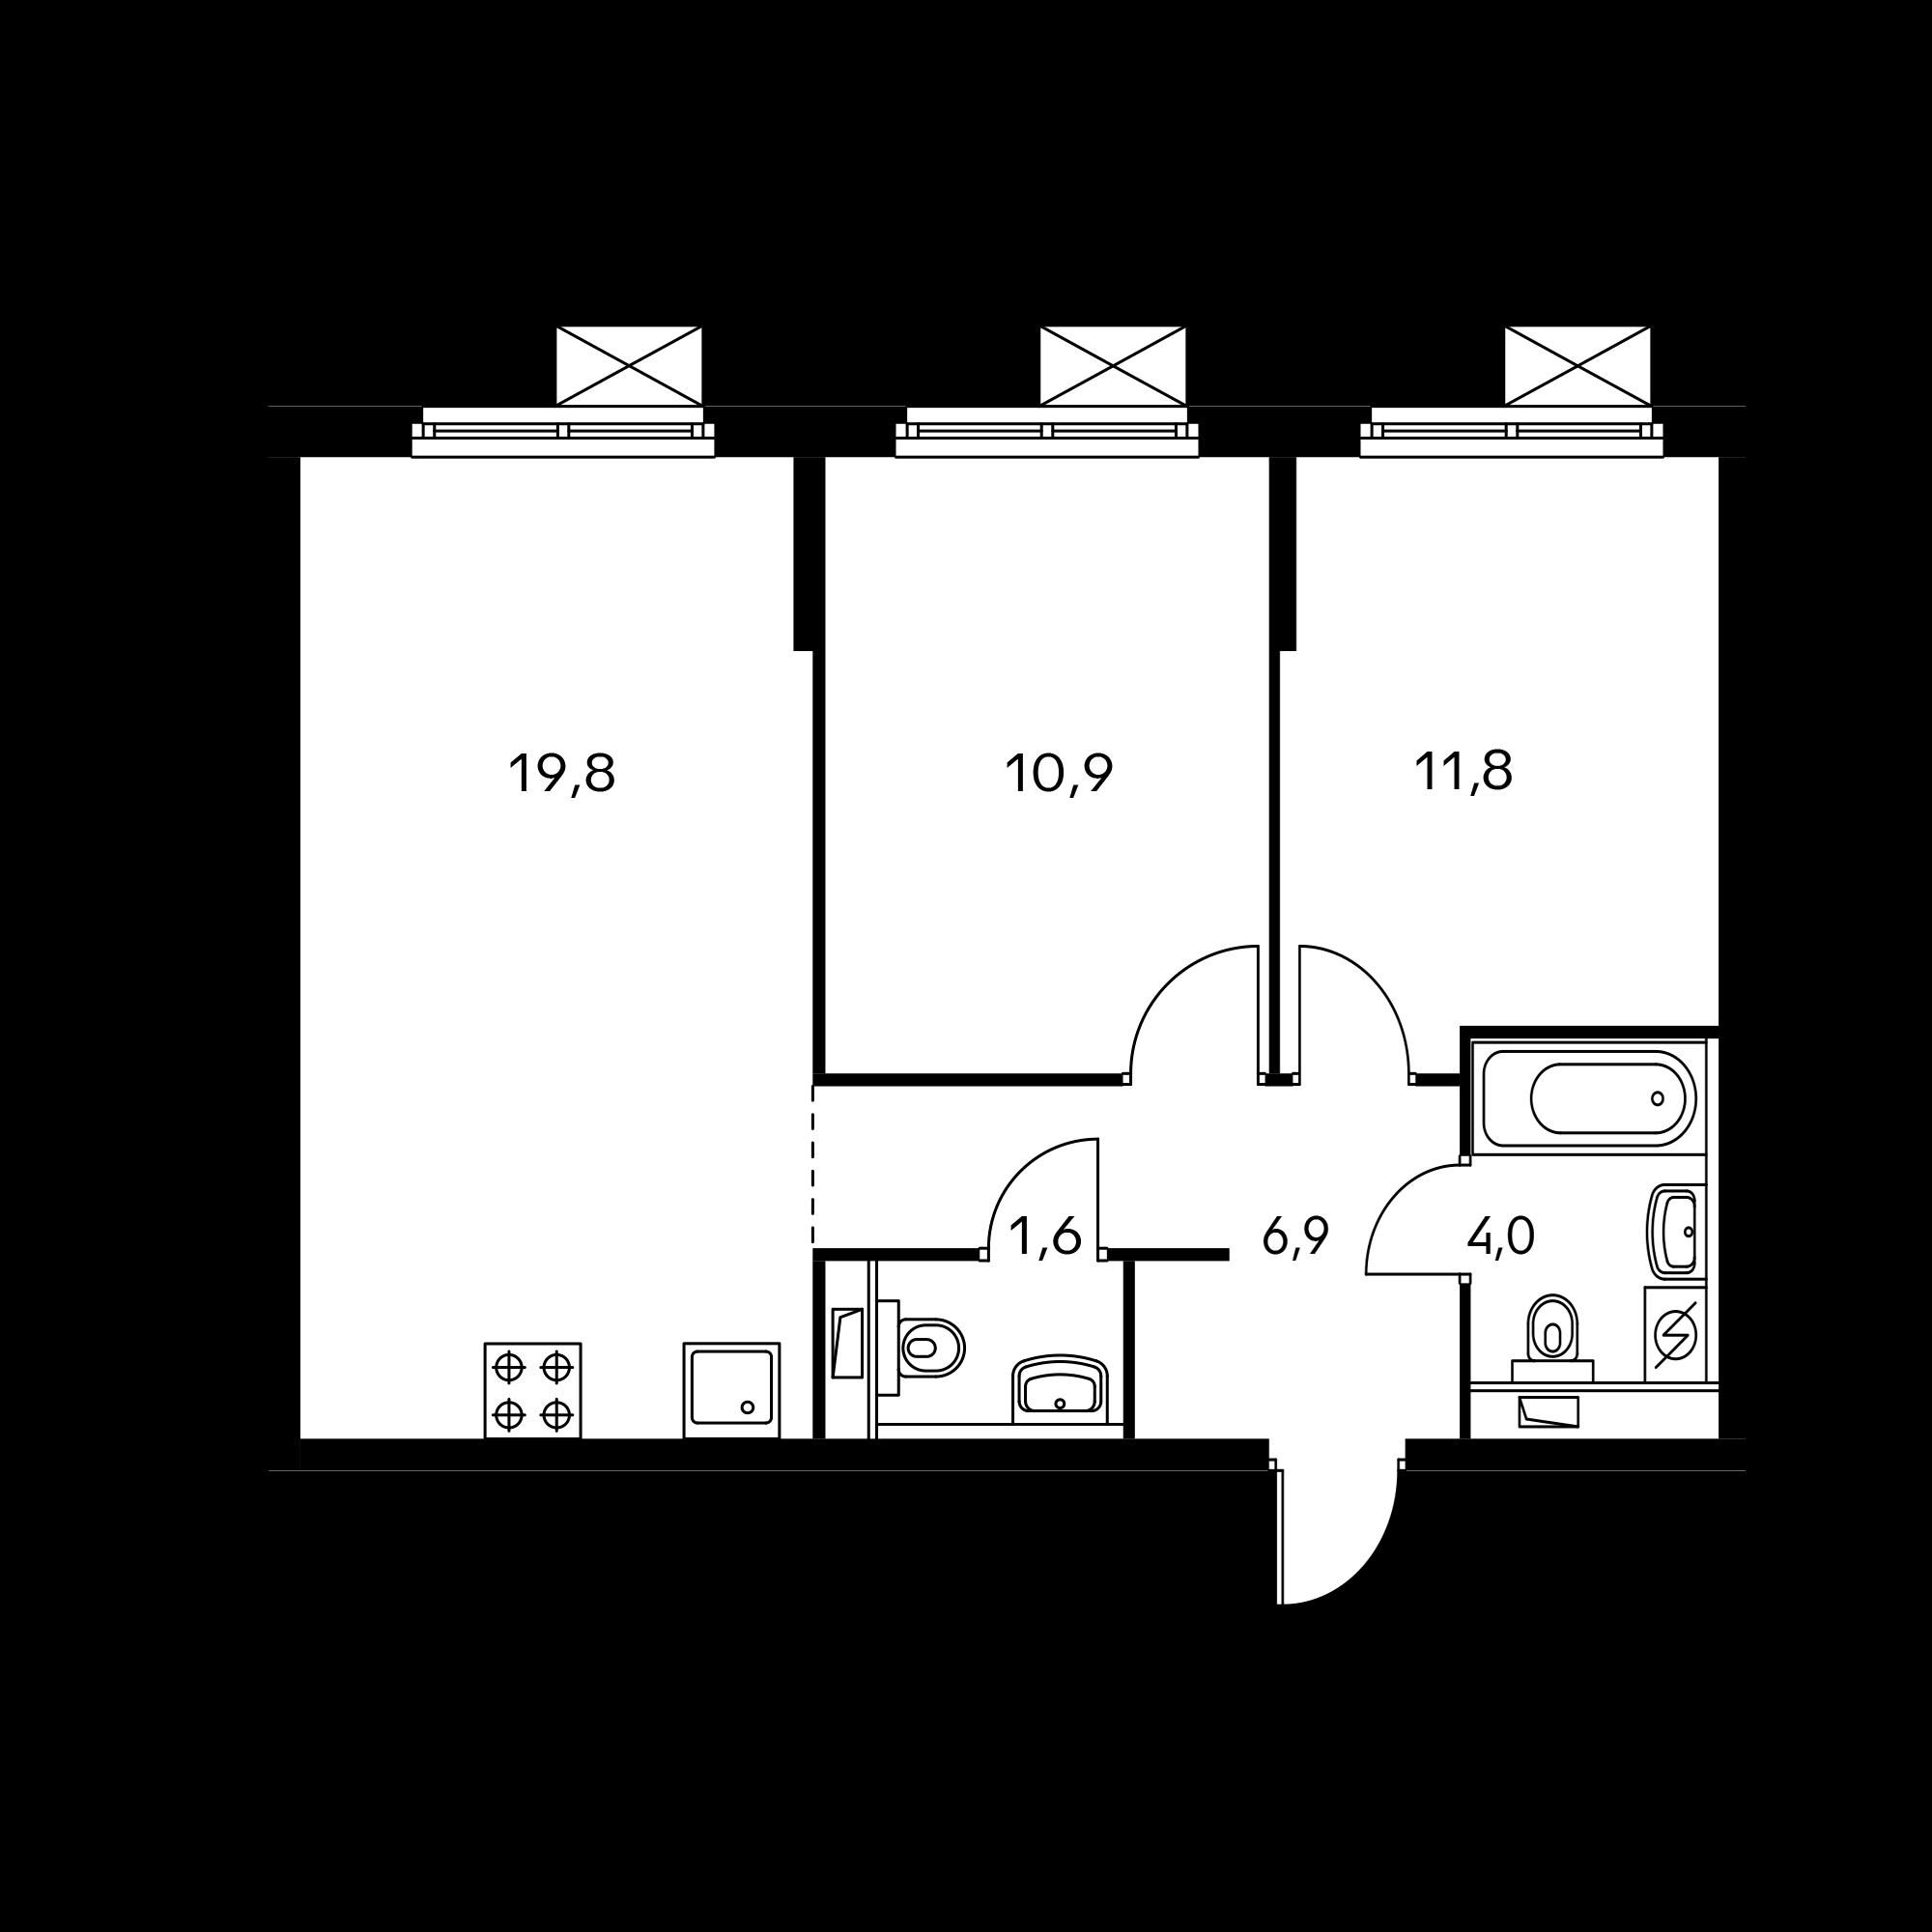 2ES8_9.6-1_S_Z11